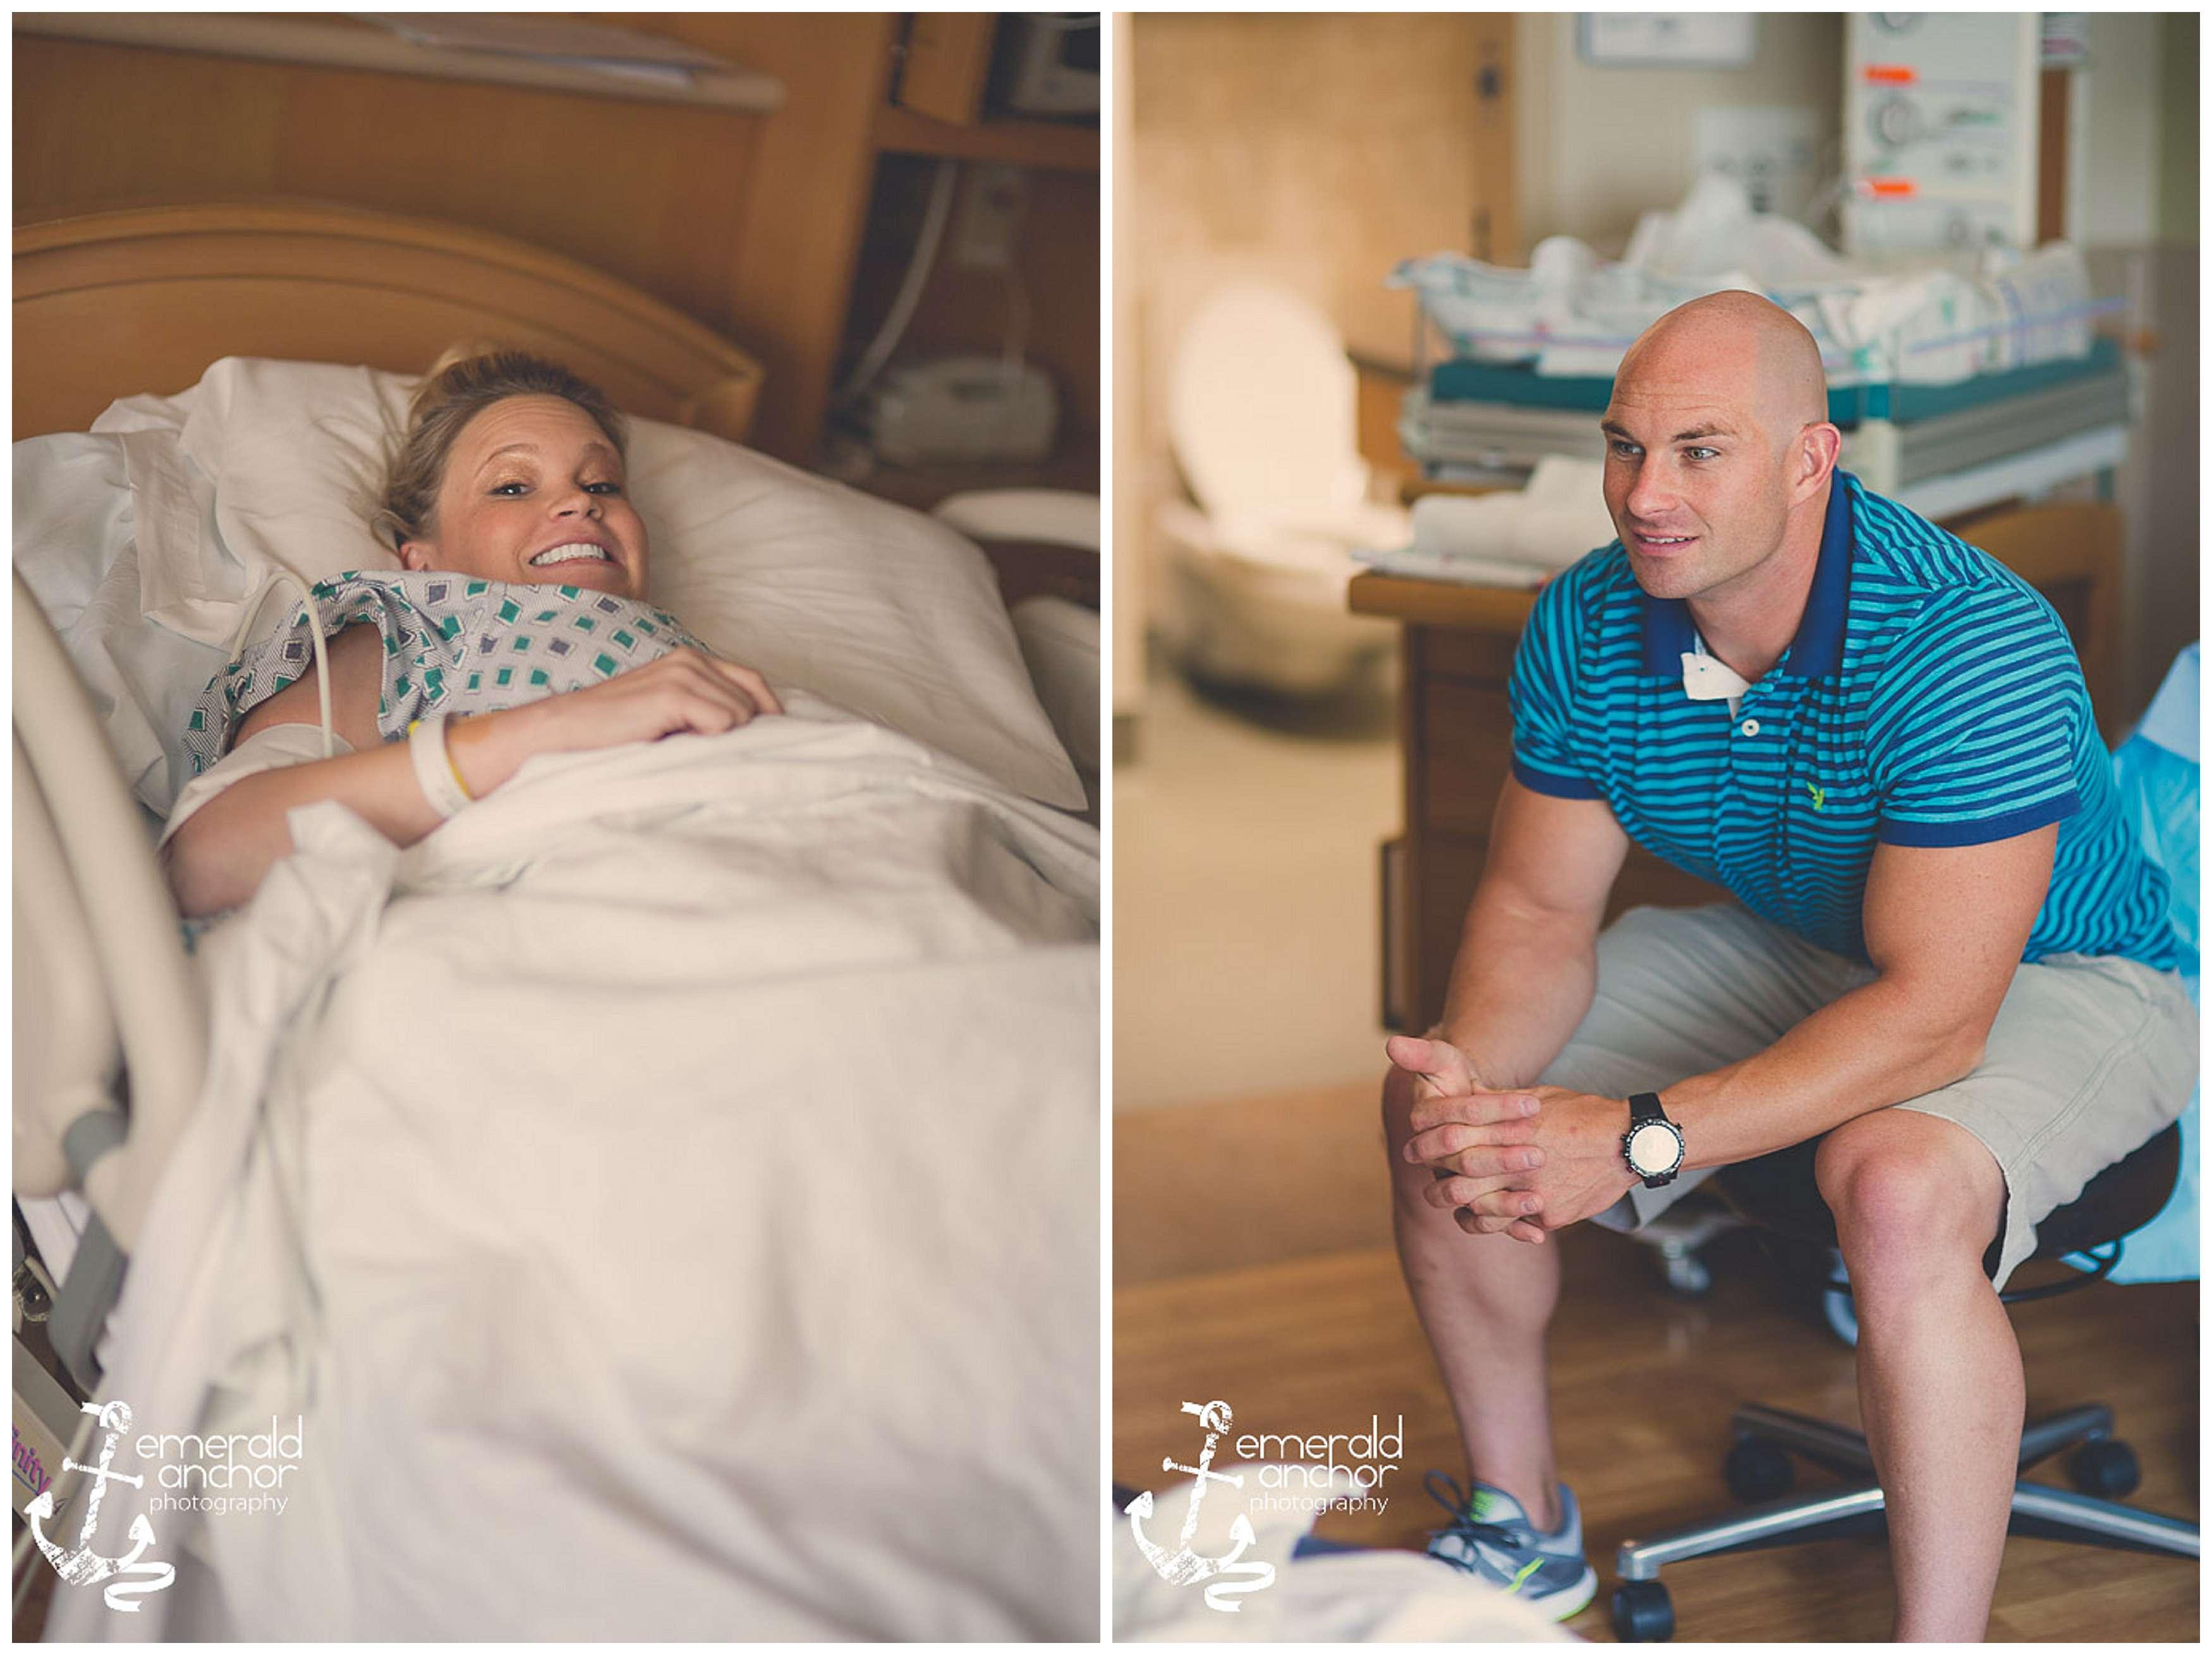 Emerald Anchor Photography Riverside Hospital Birth Story Photography Uriah Kade (47)